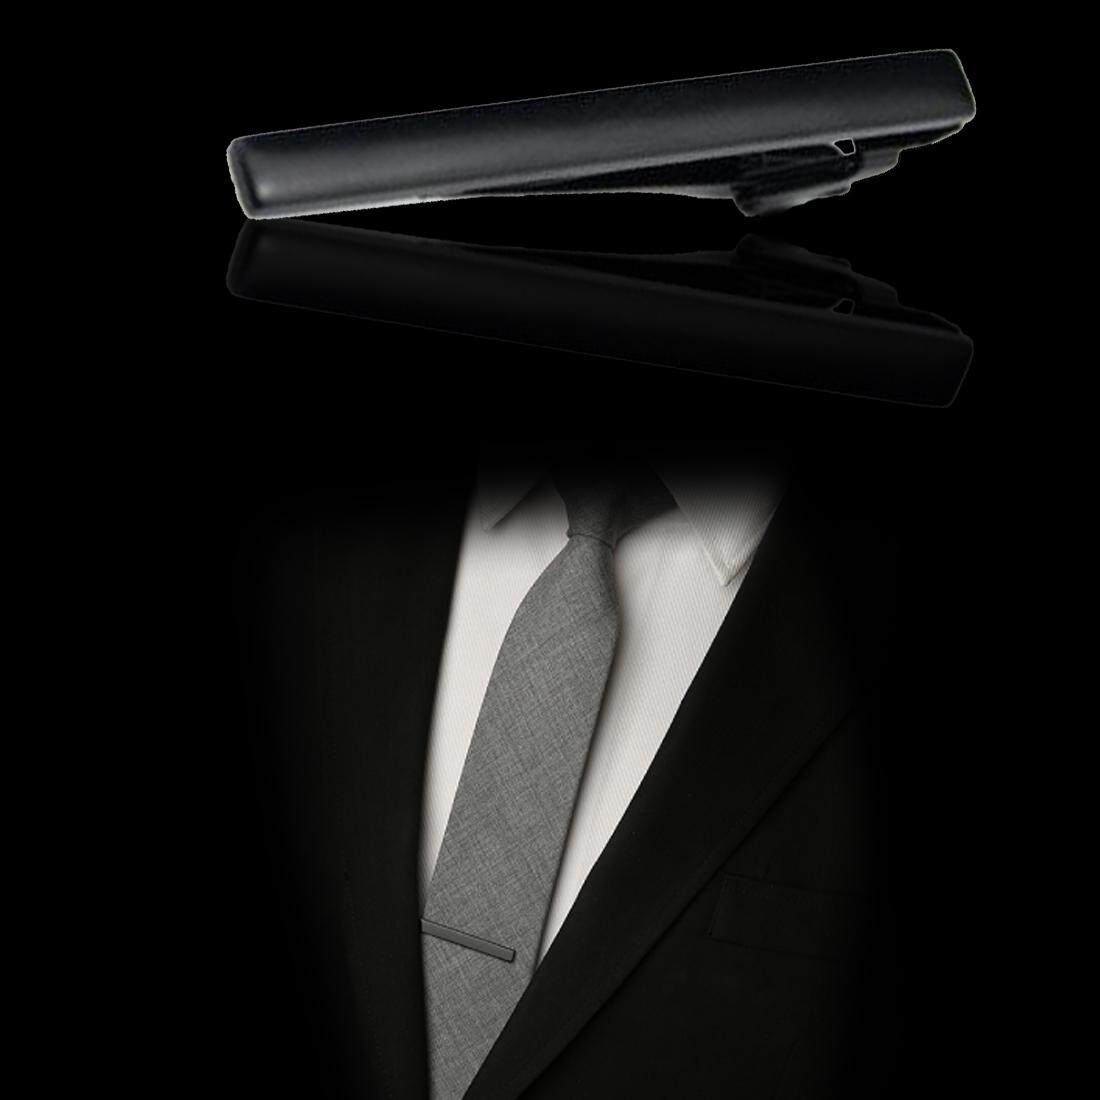 Kelebihan Vintage Man Stainless Steel Necktie Tie Clasps Clip Pin Houseofcuff Leather Gift Black Detail Gambar Bar Intl Terbaru